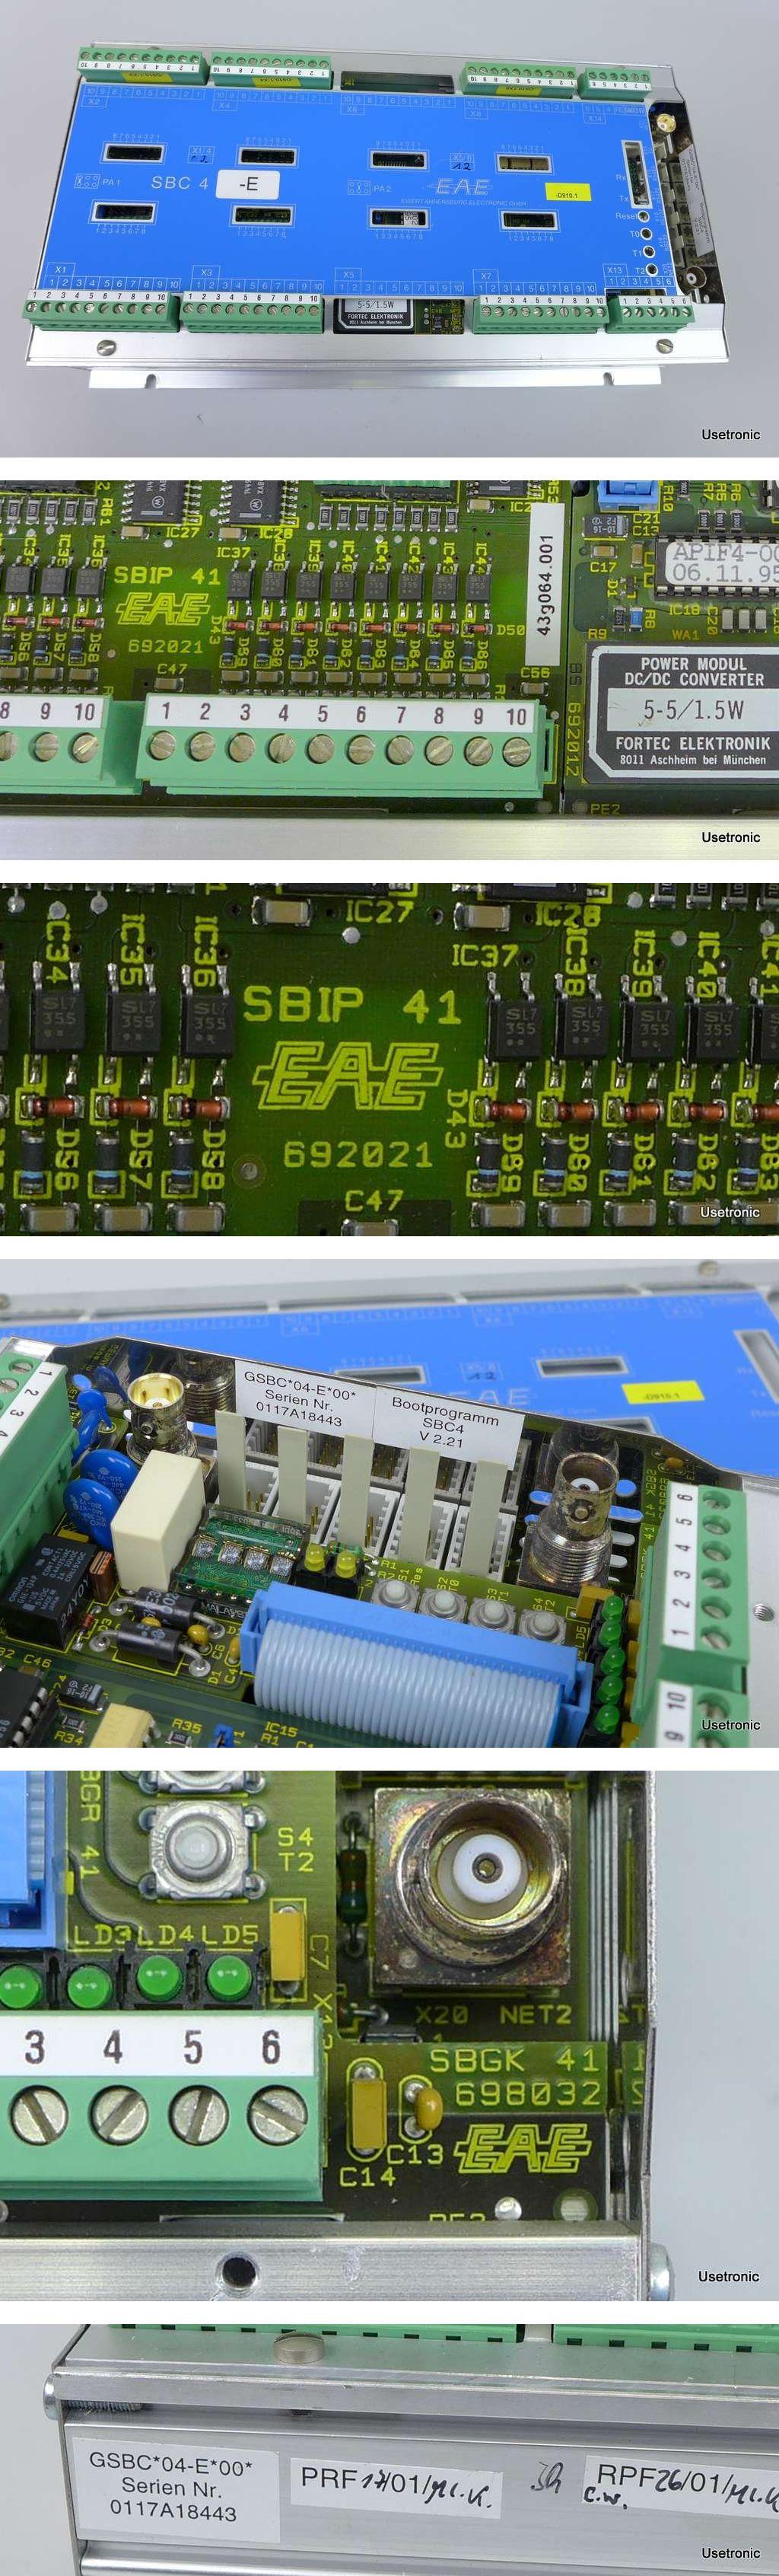 EAE SBC 4 E GSBC 04-E